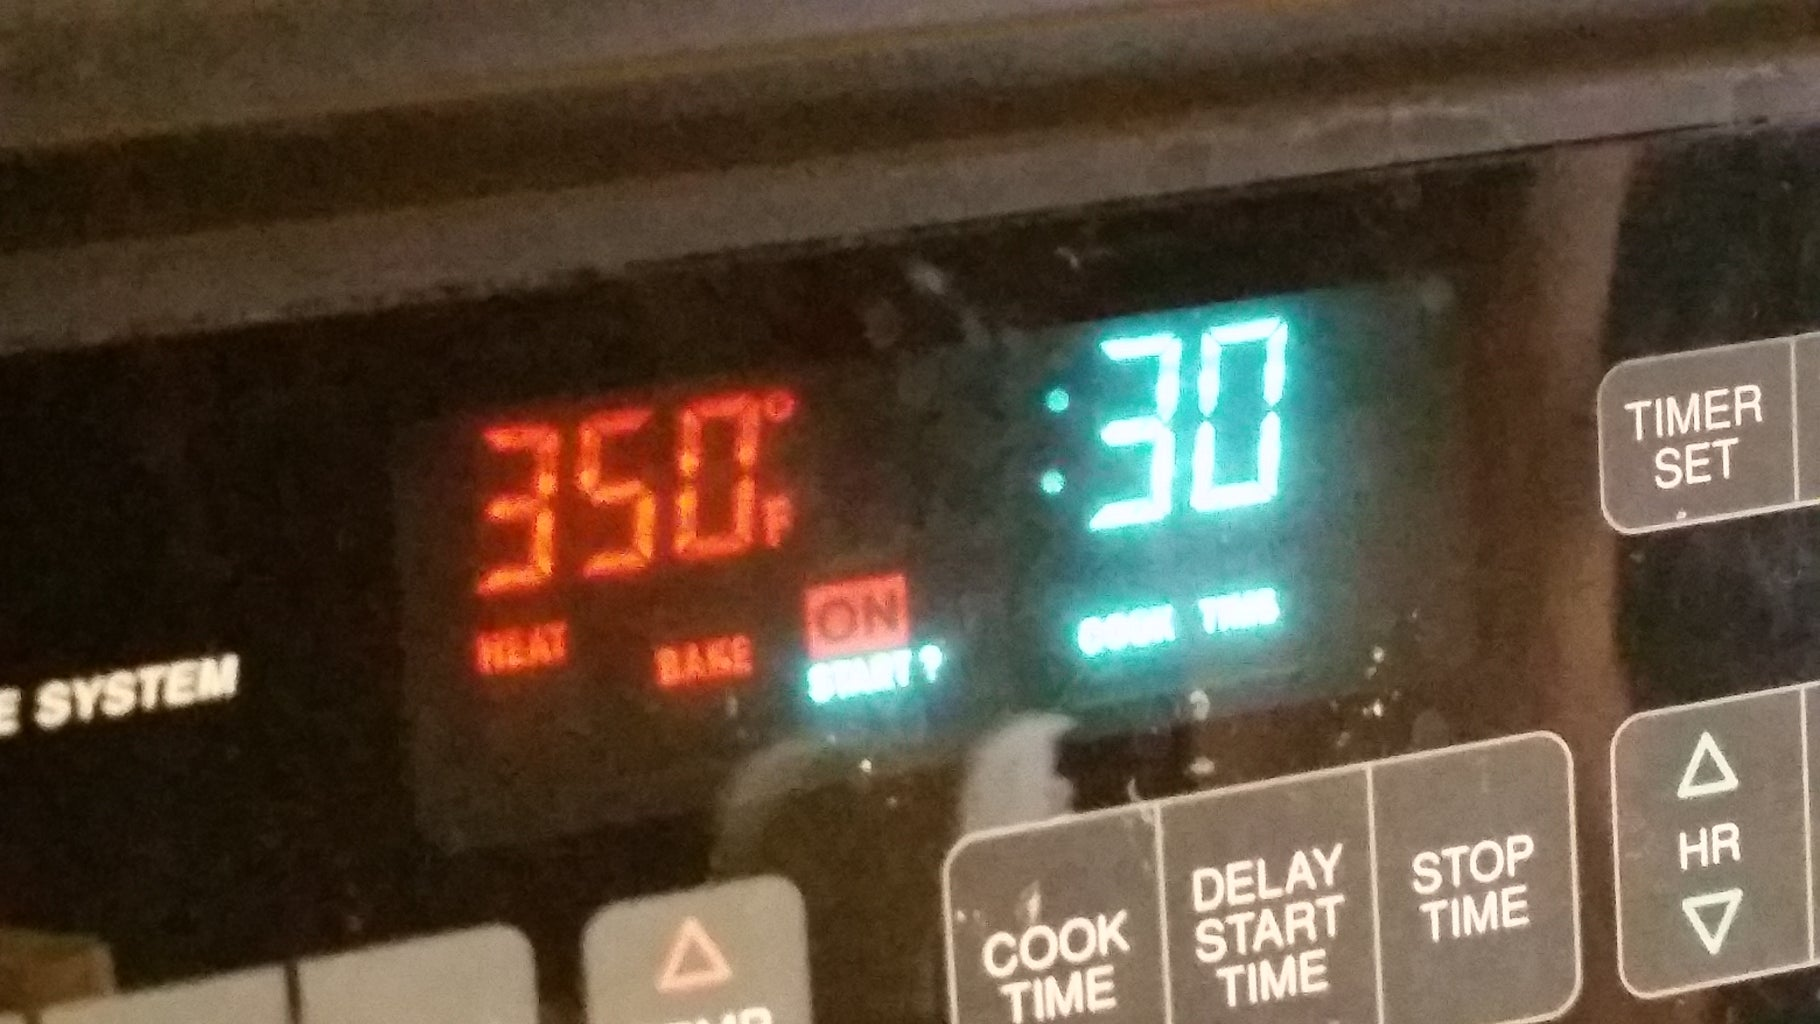 Preheat Your Oven